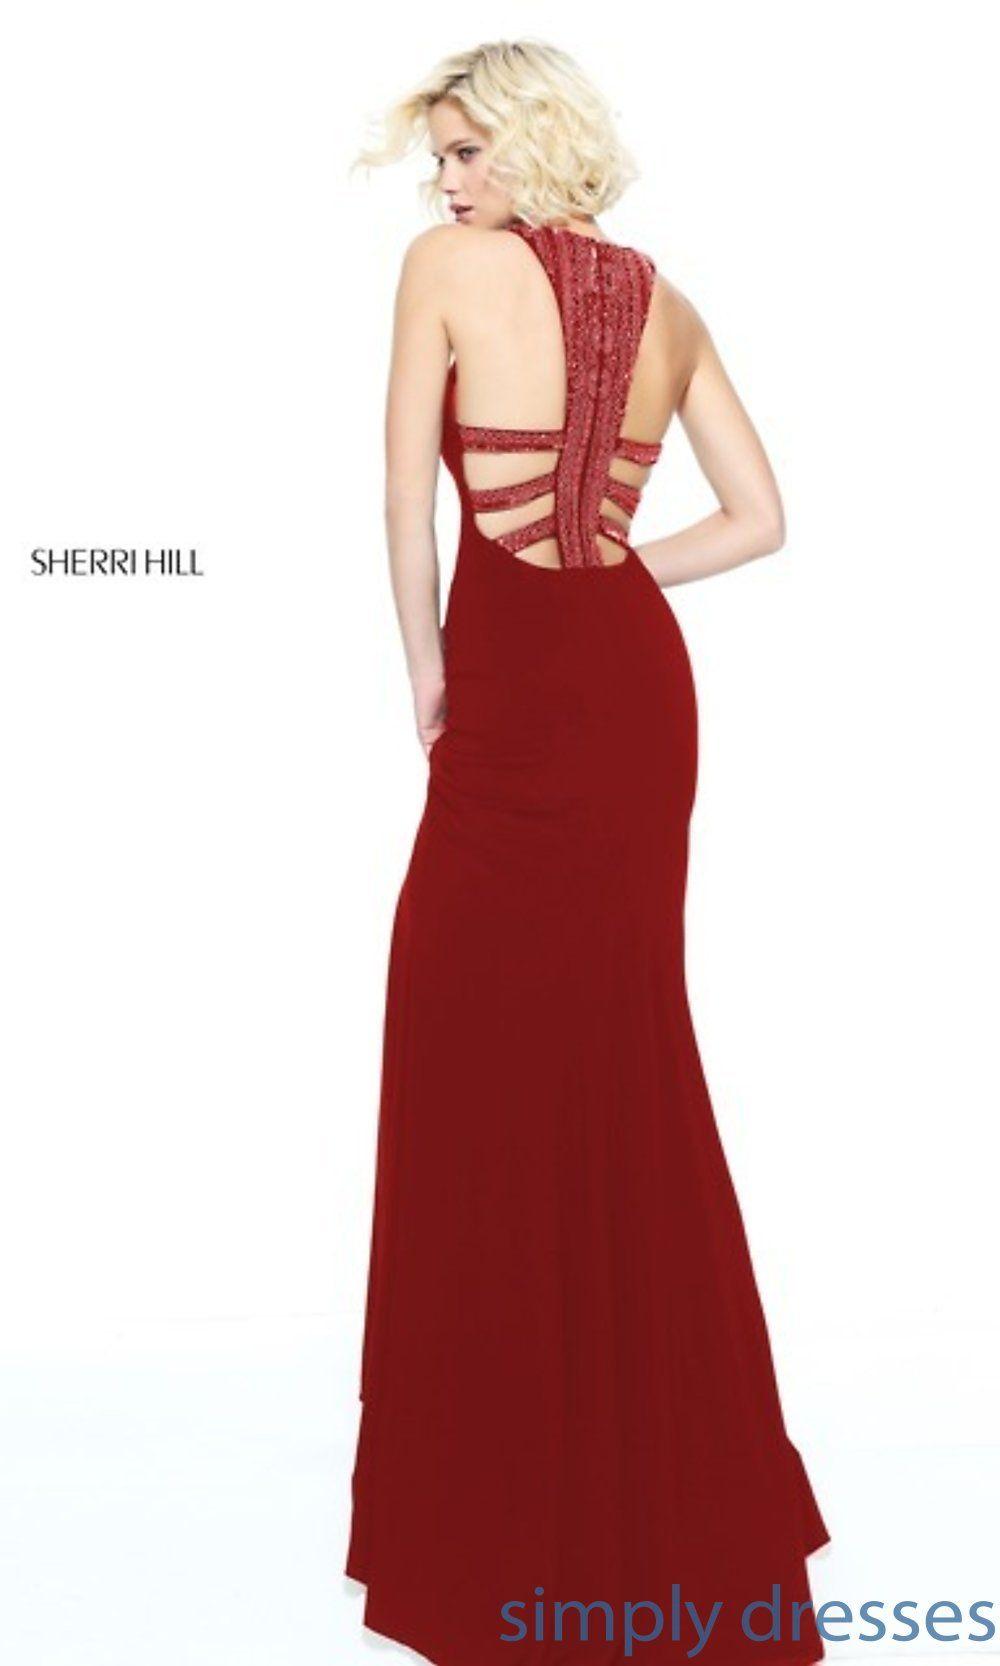 Sherri hill long formal dress with beaded collar in long